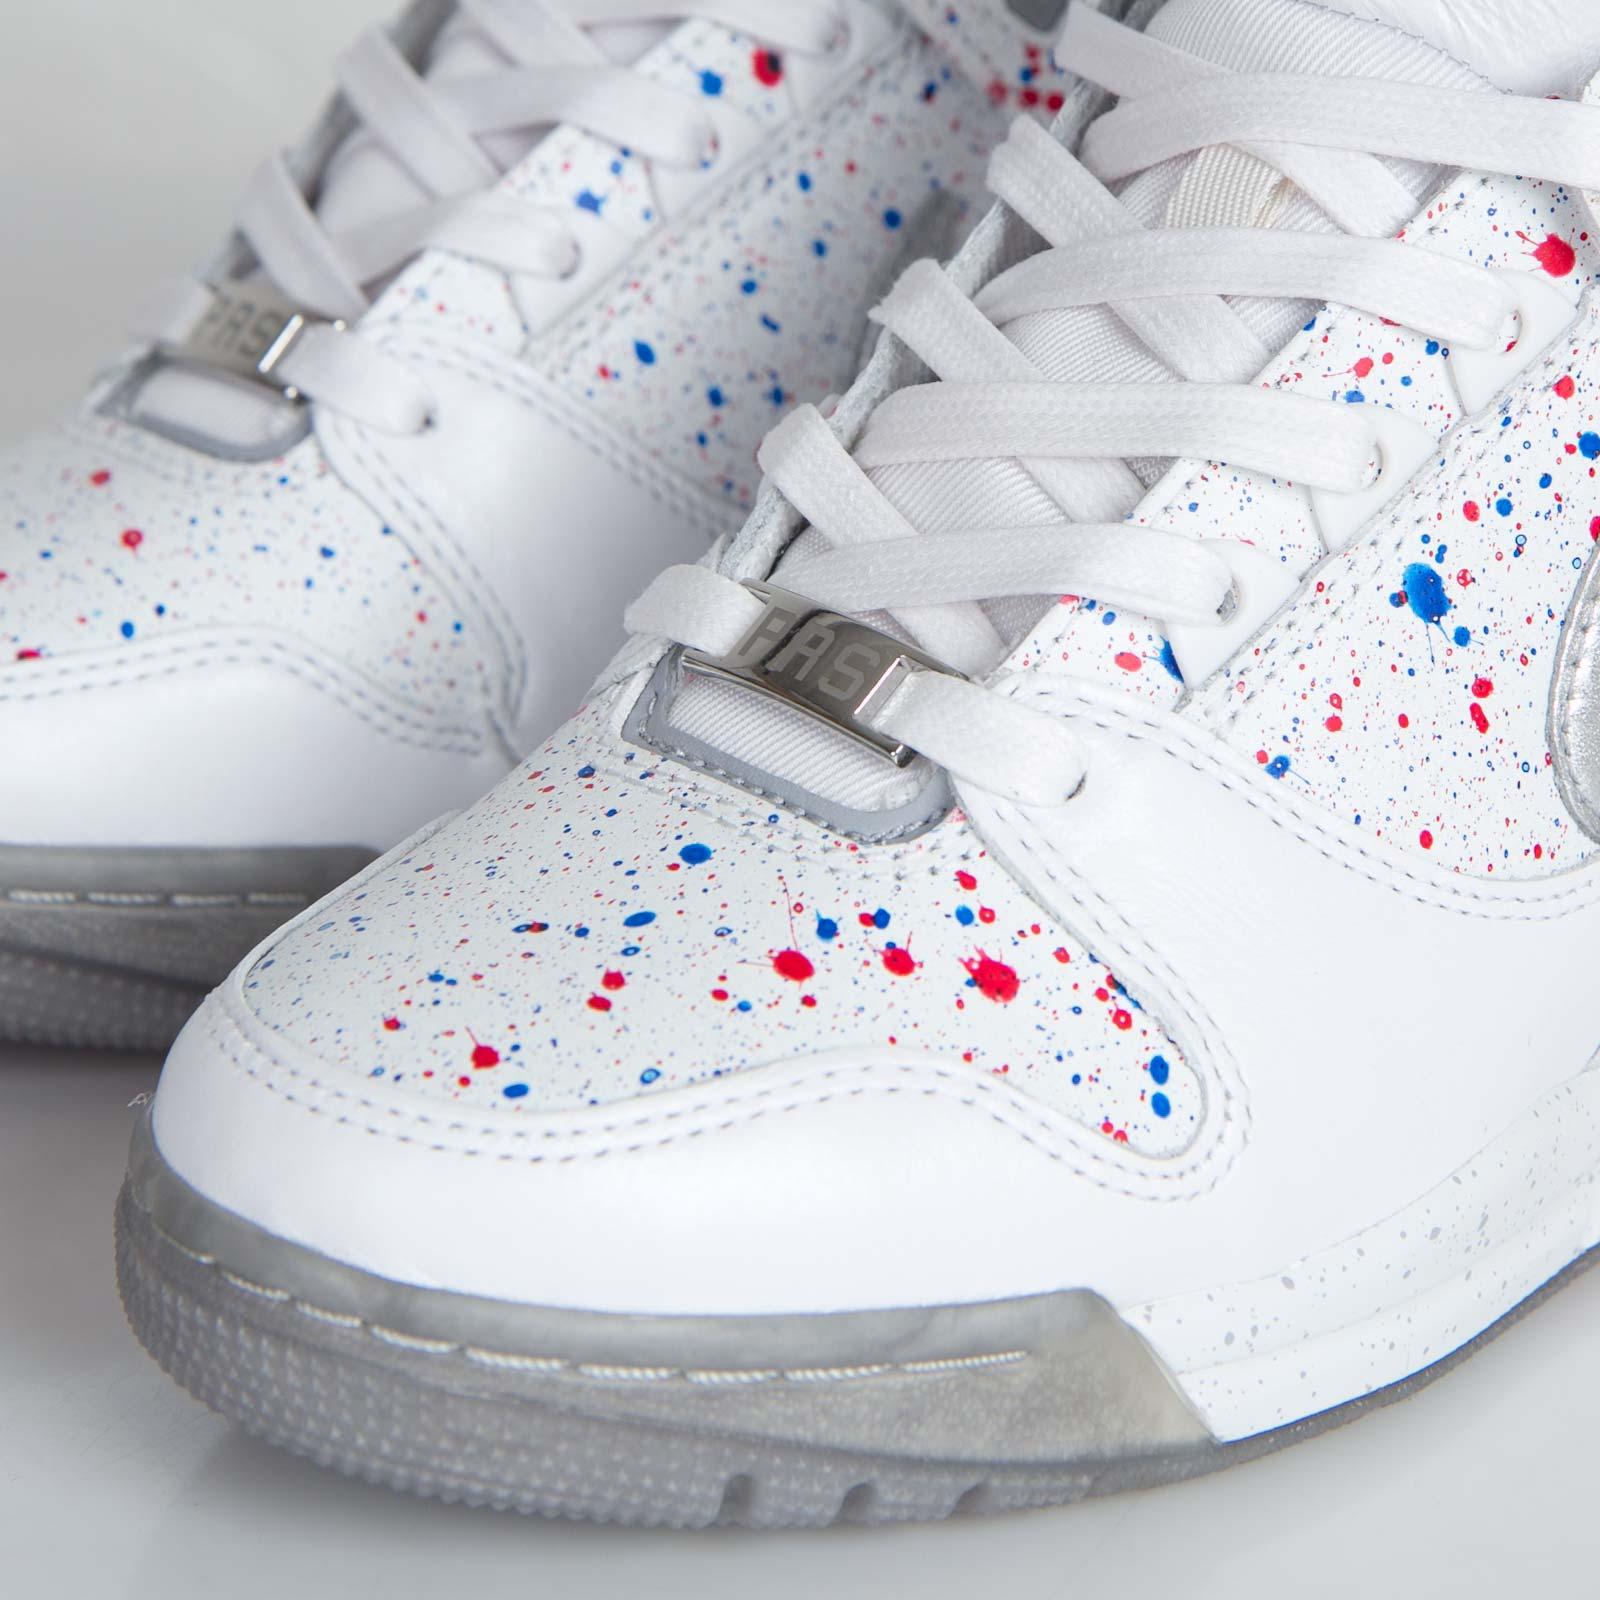 superior quality e28d9 40d30 Nike W Air Revolution Sky Hi FW QS - 633525-100 - Sneakersnstuff   sneakers    streetwear online since 1999